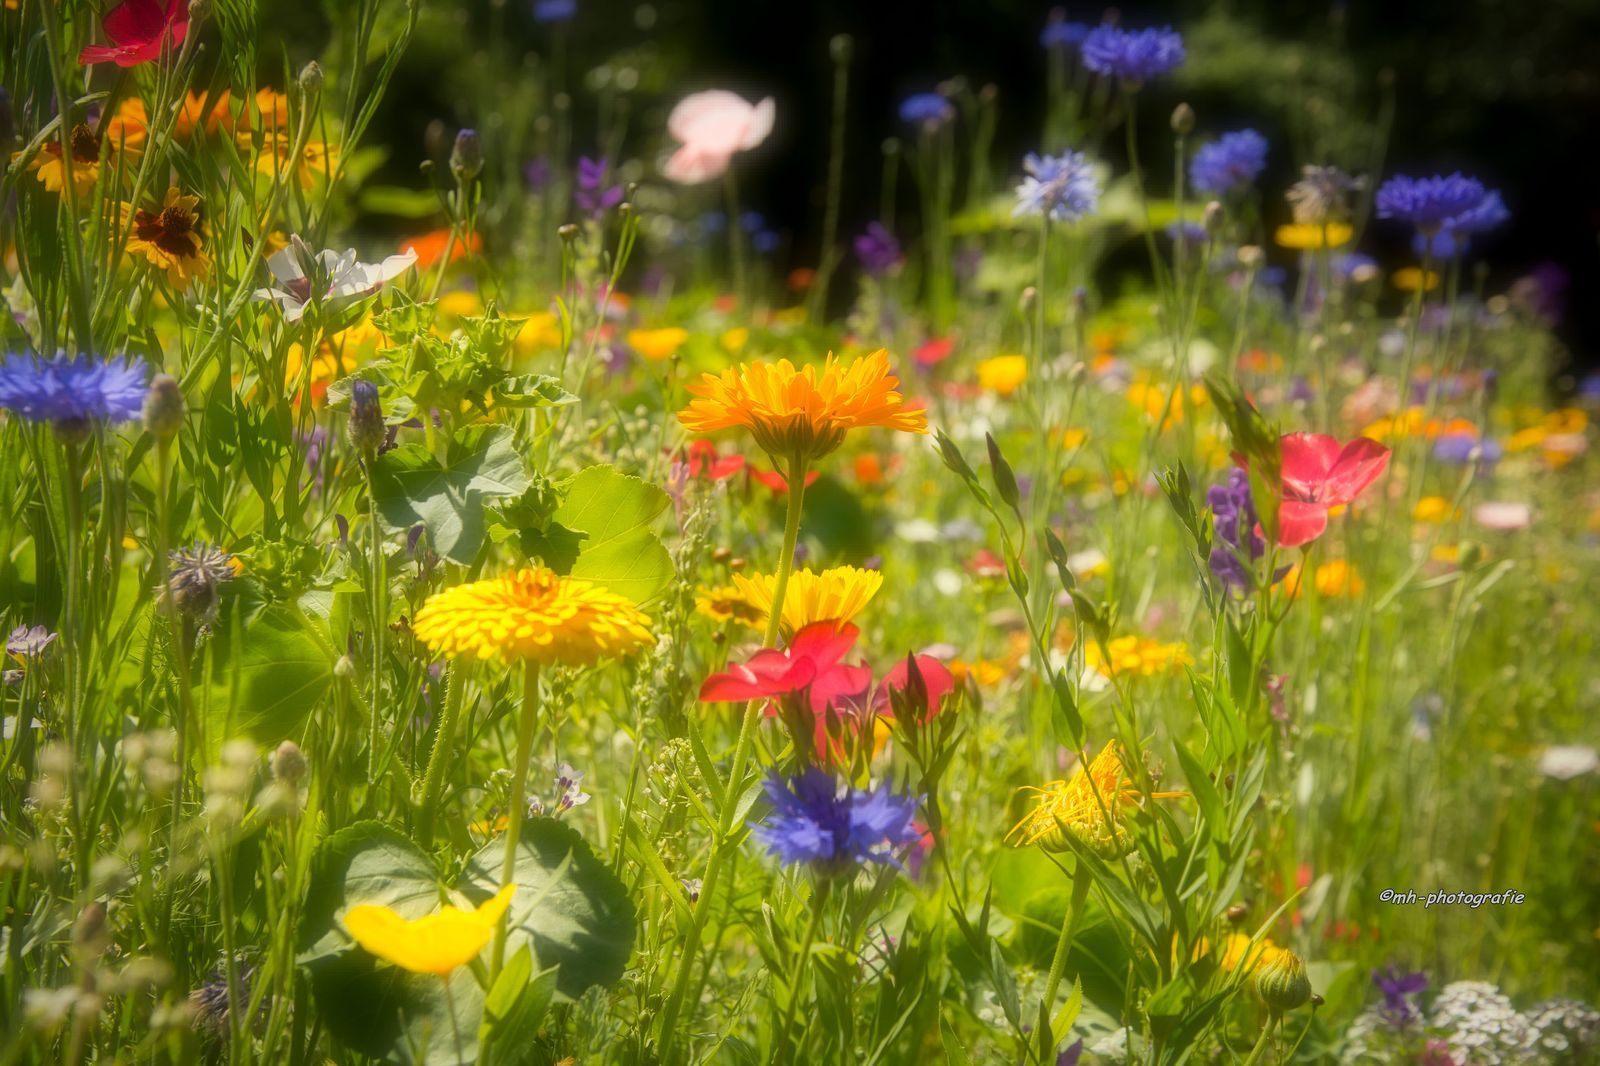 Blumen-DSC_4962-mh-photografie